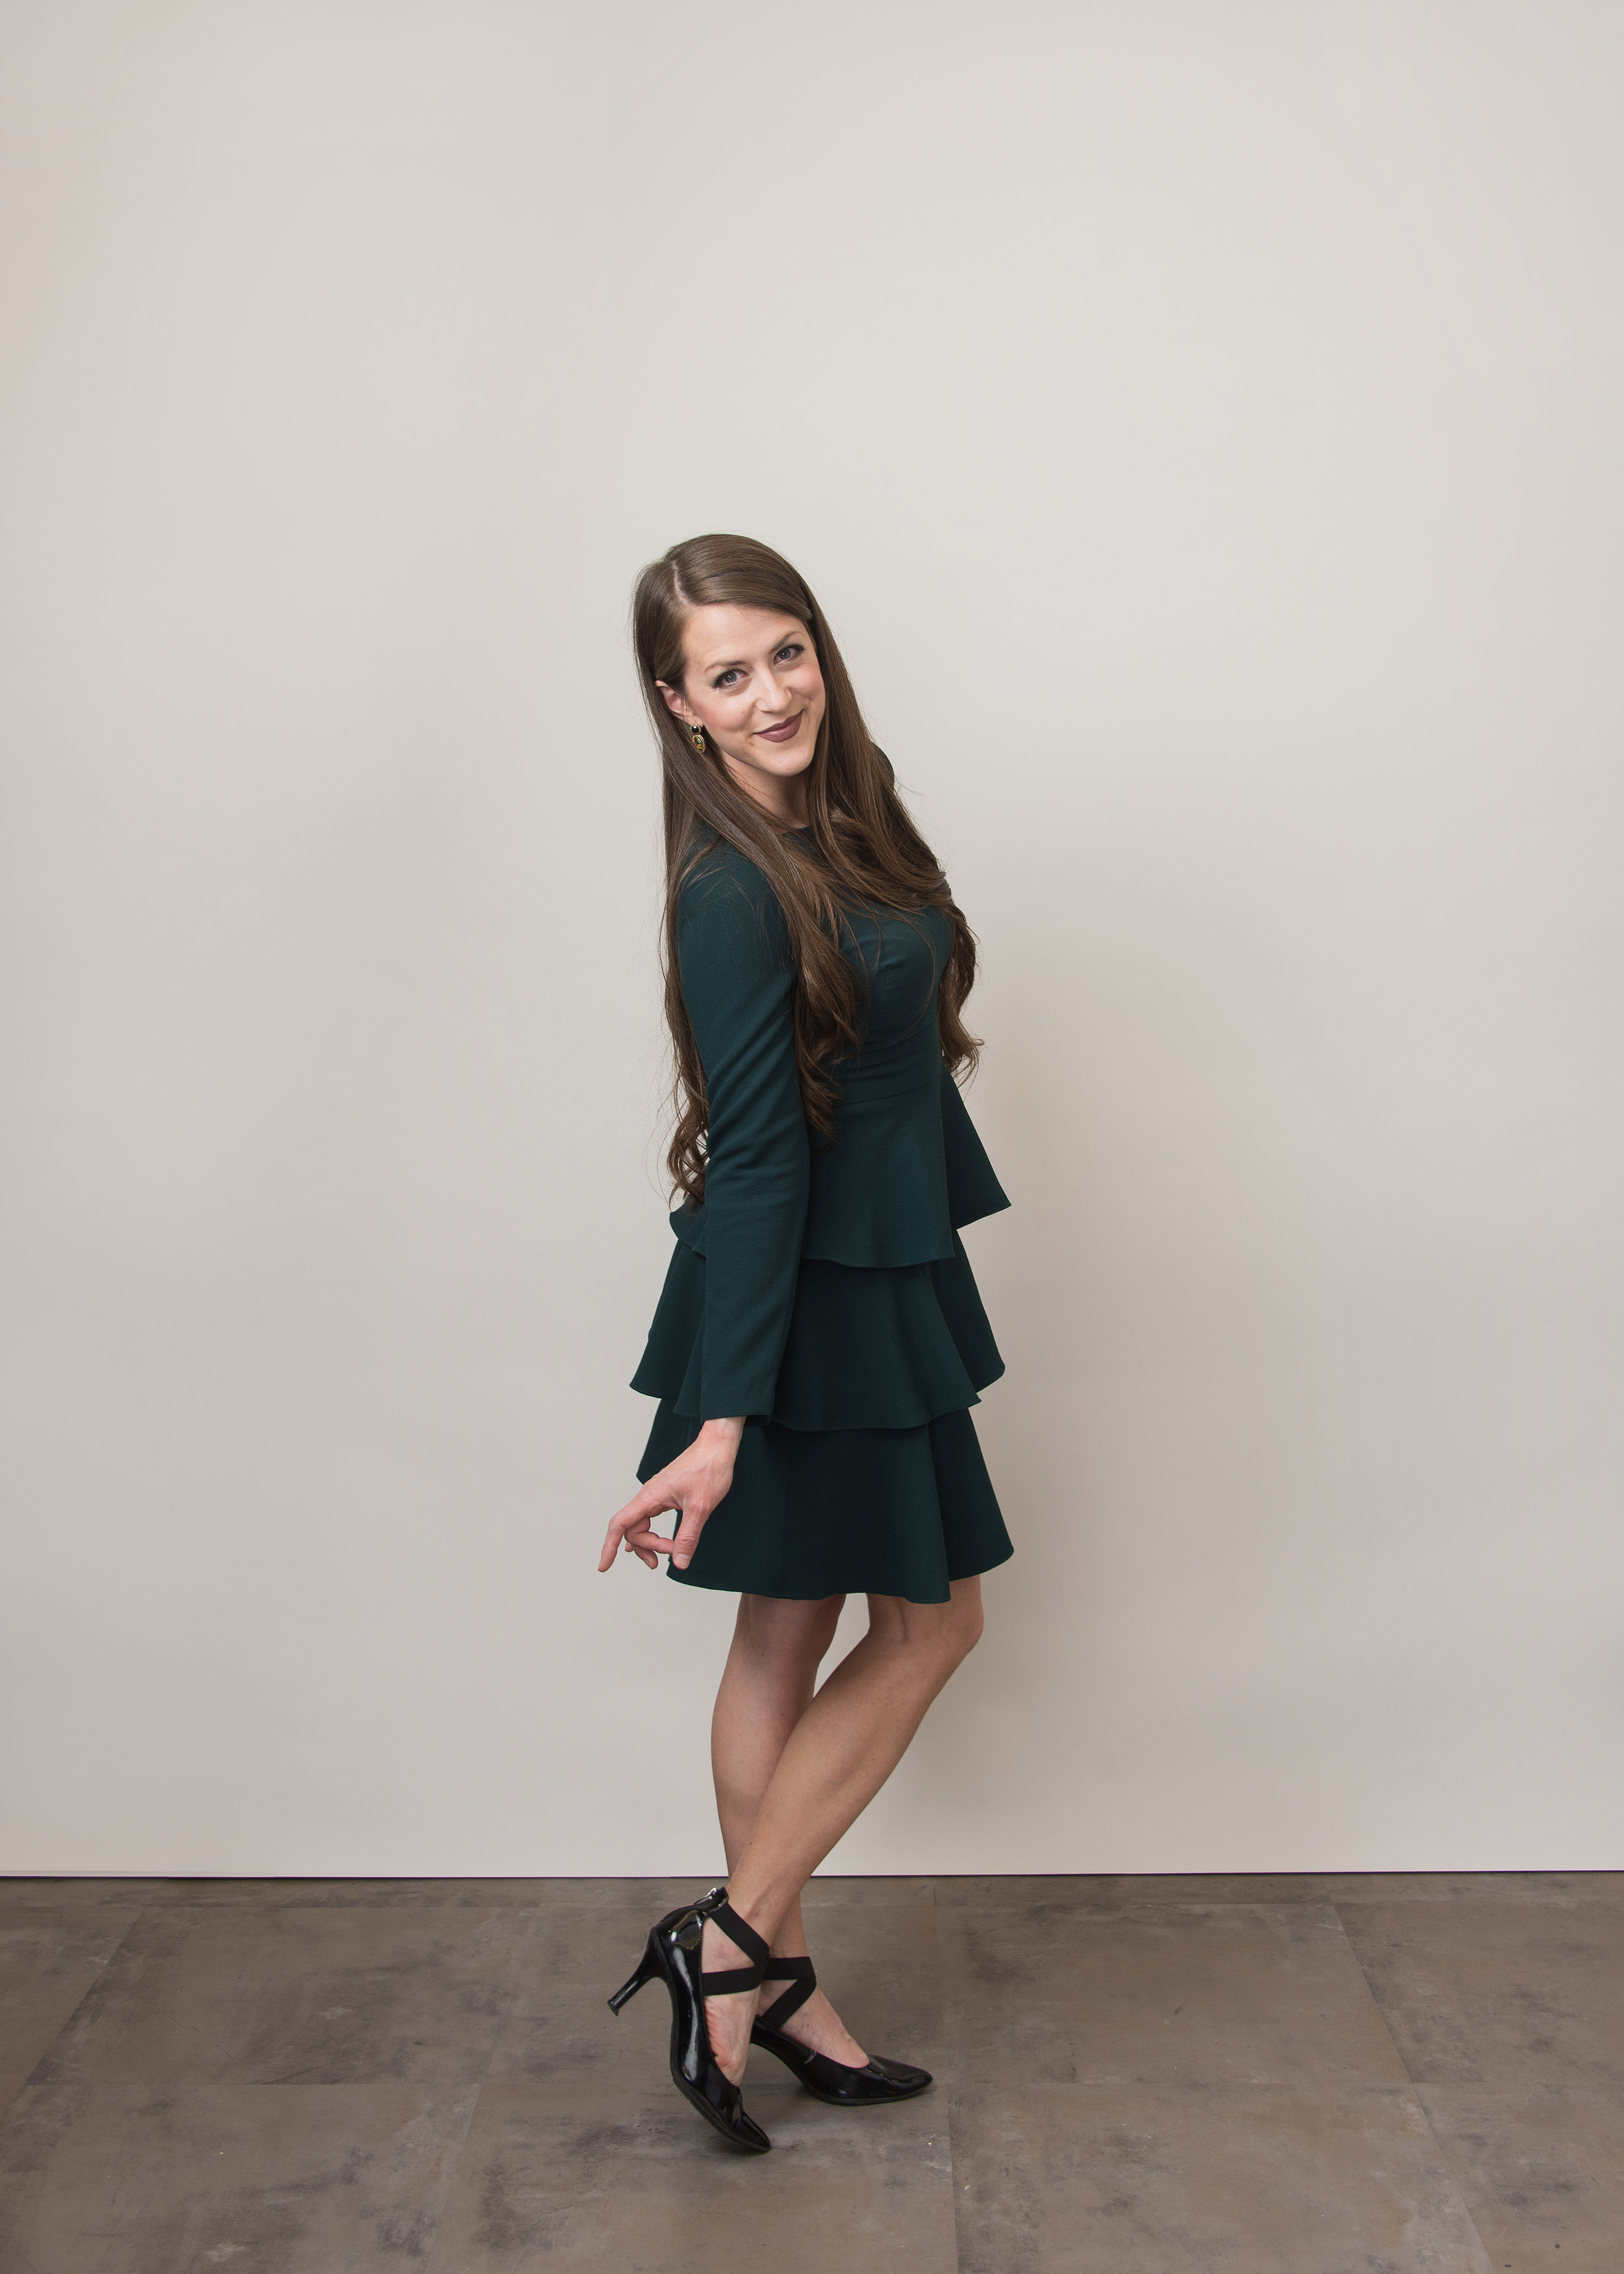 Megan Santi